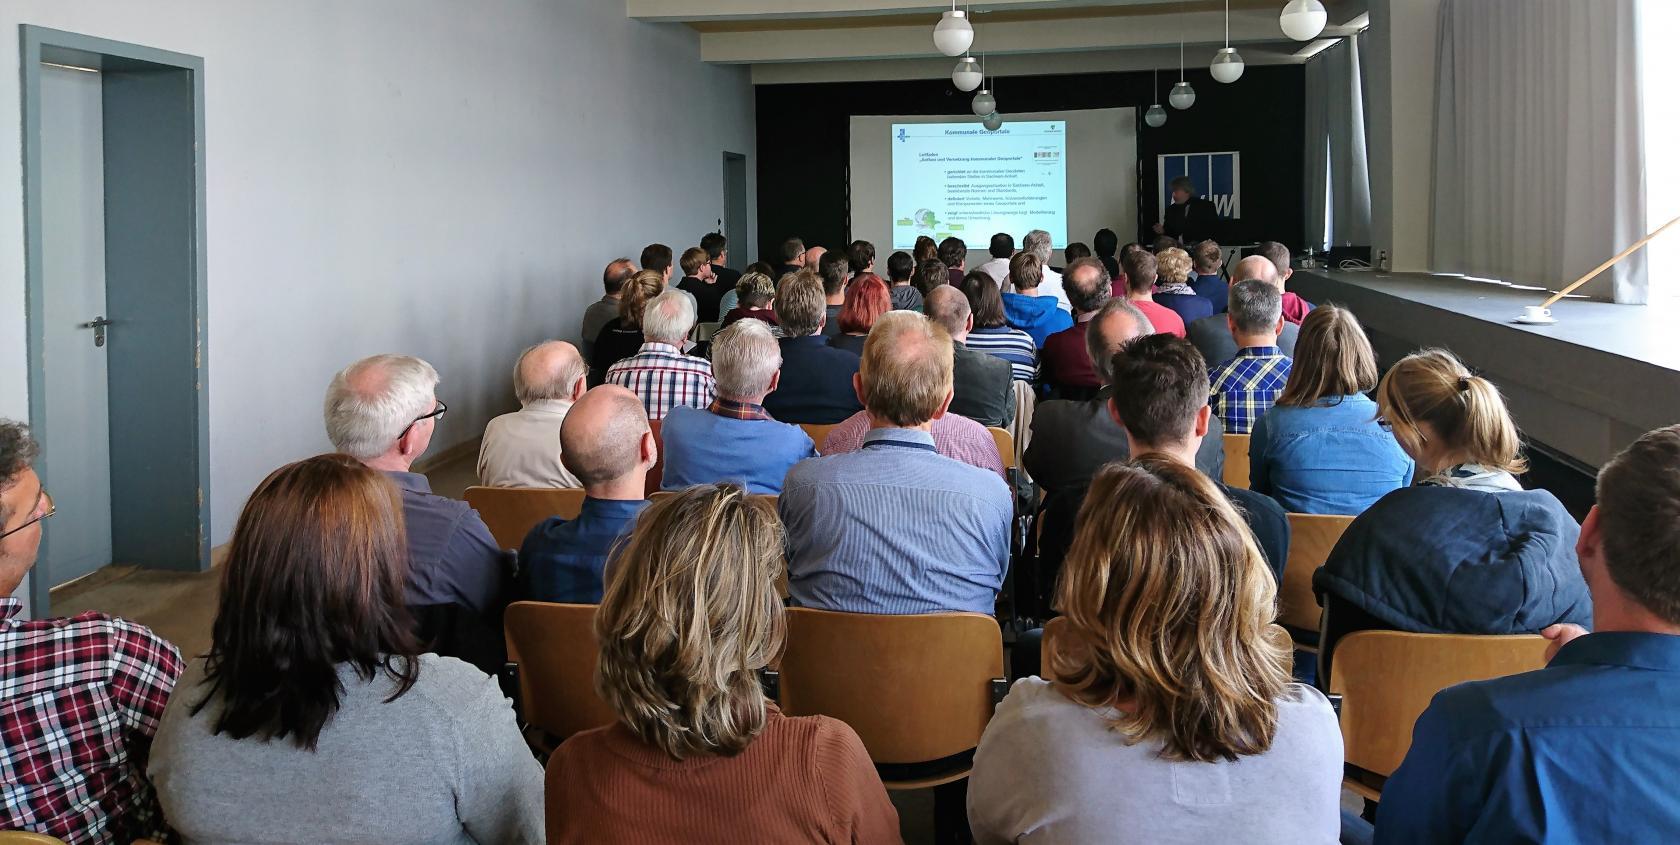 Fachtagung DVW Sachsen-Anhalt (Bauhaus Dessau) (Bild: Matthias Völzke)